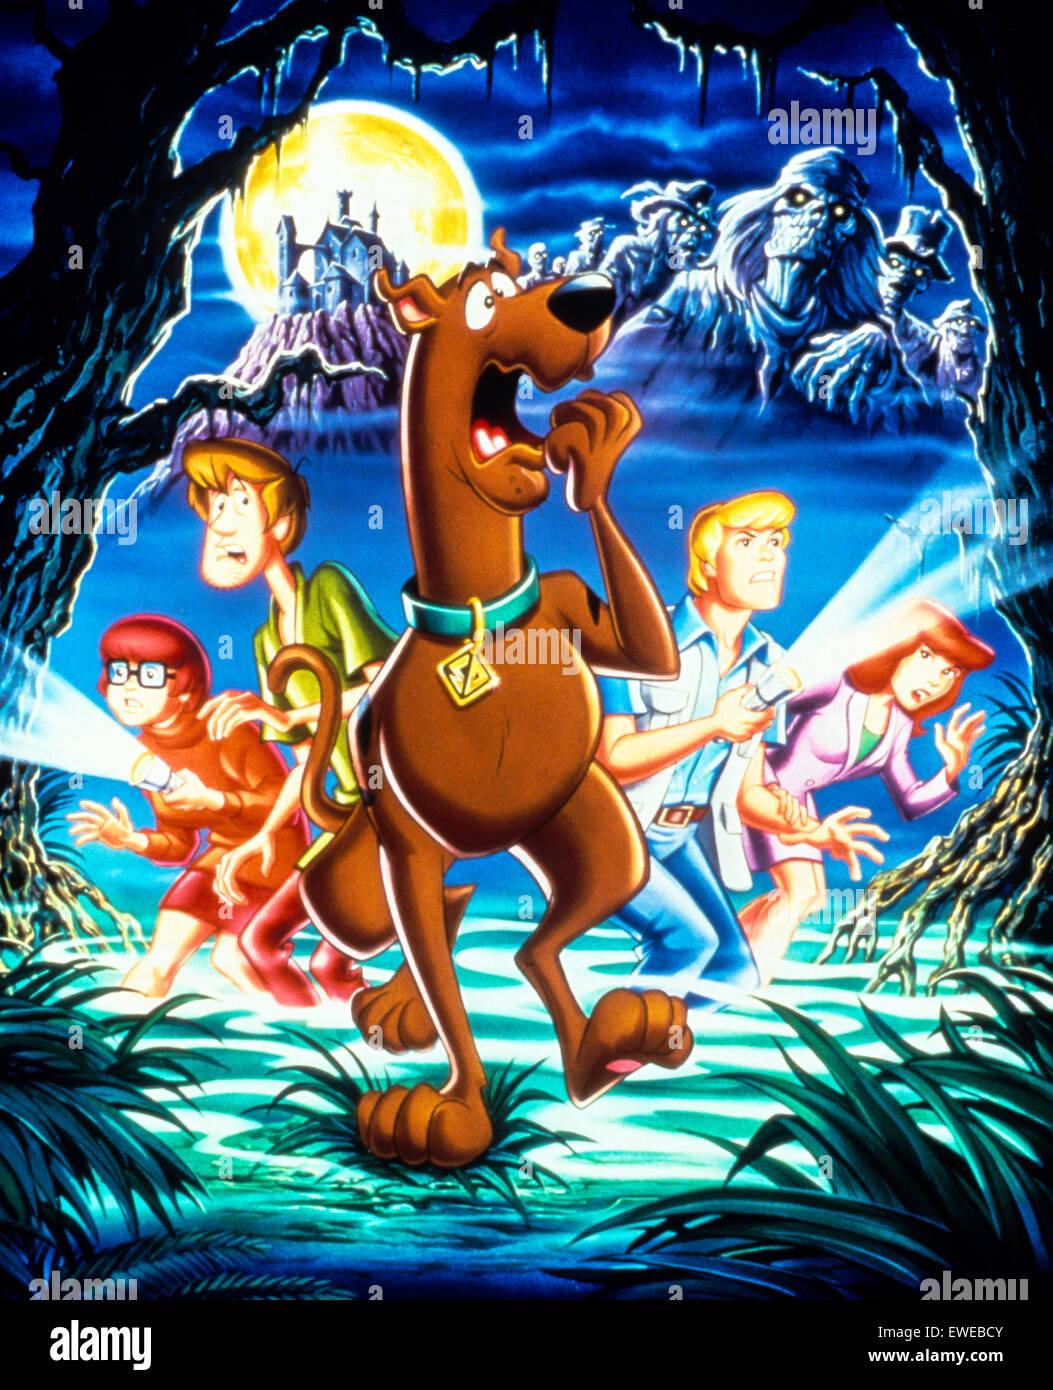 Scooby Doo Stockbild